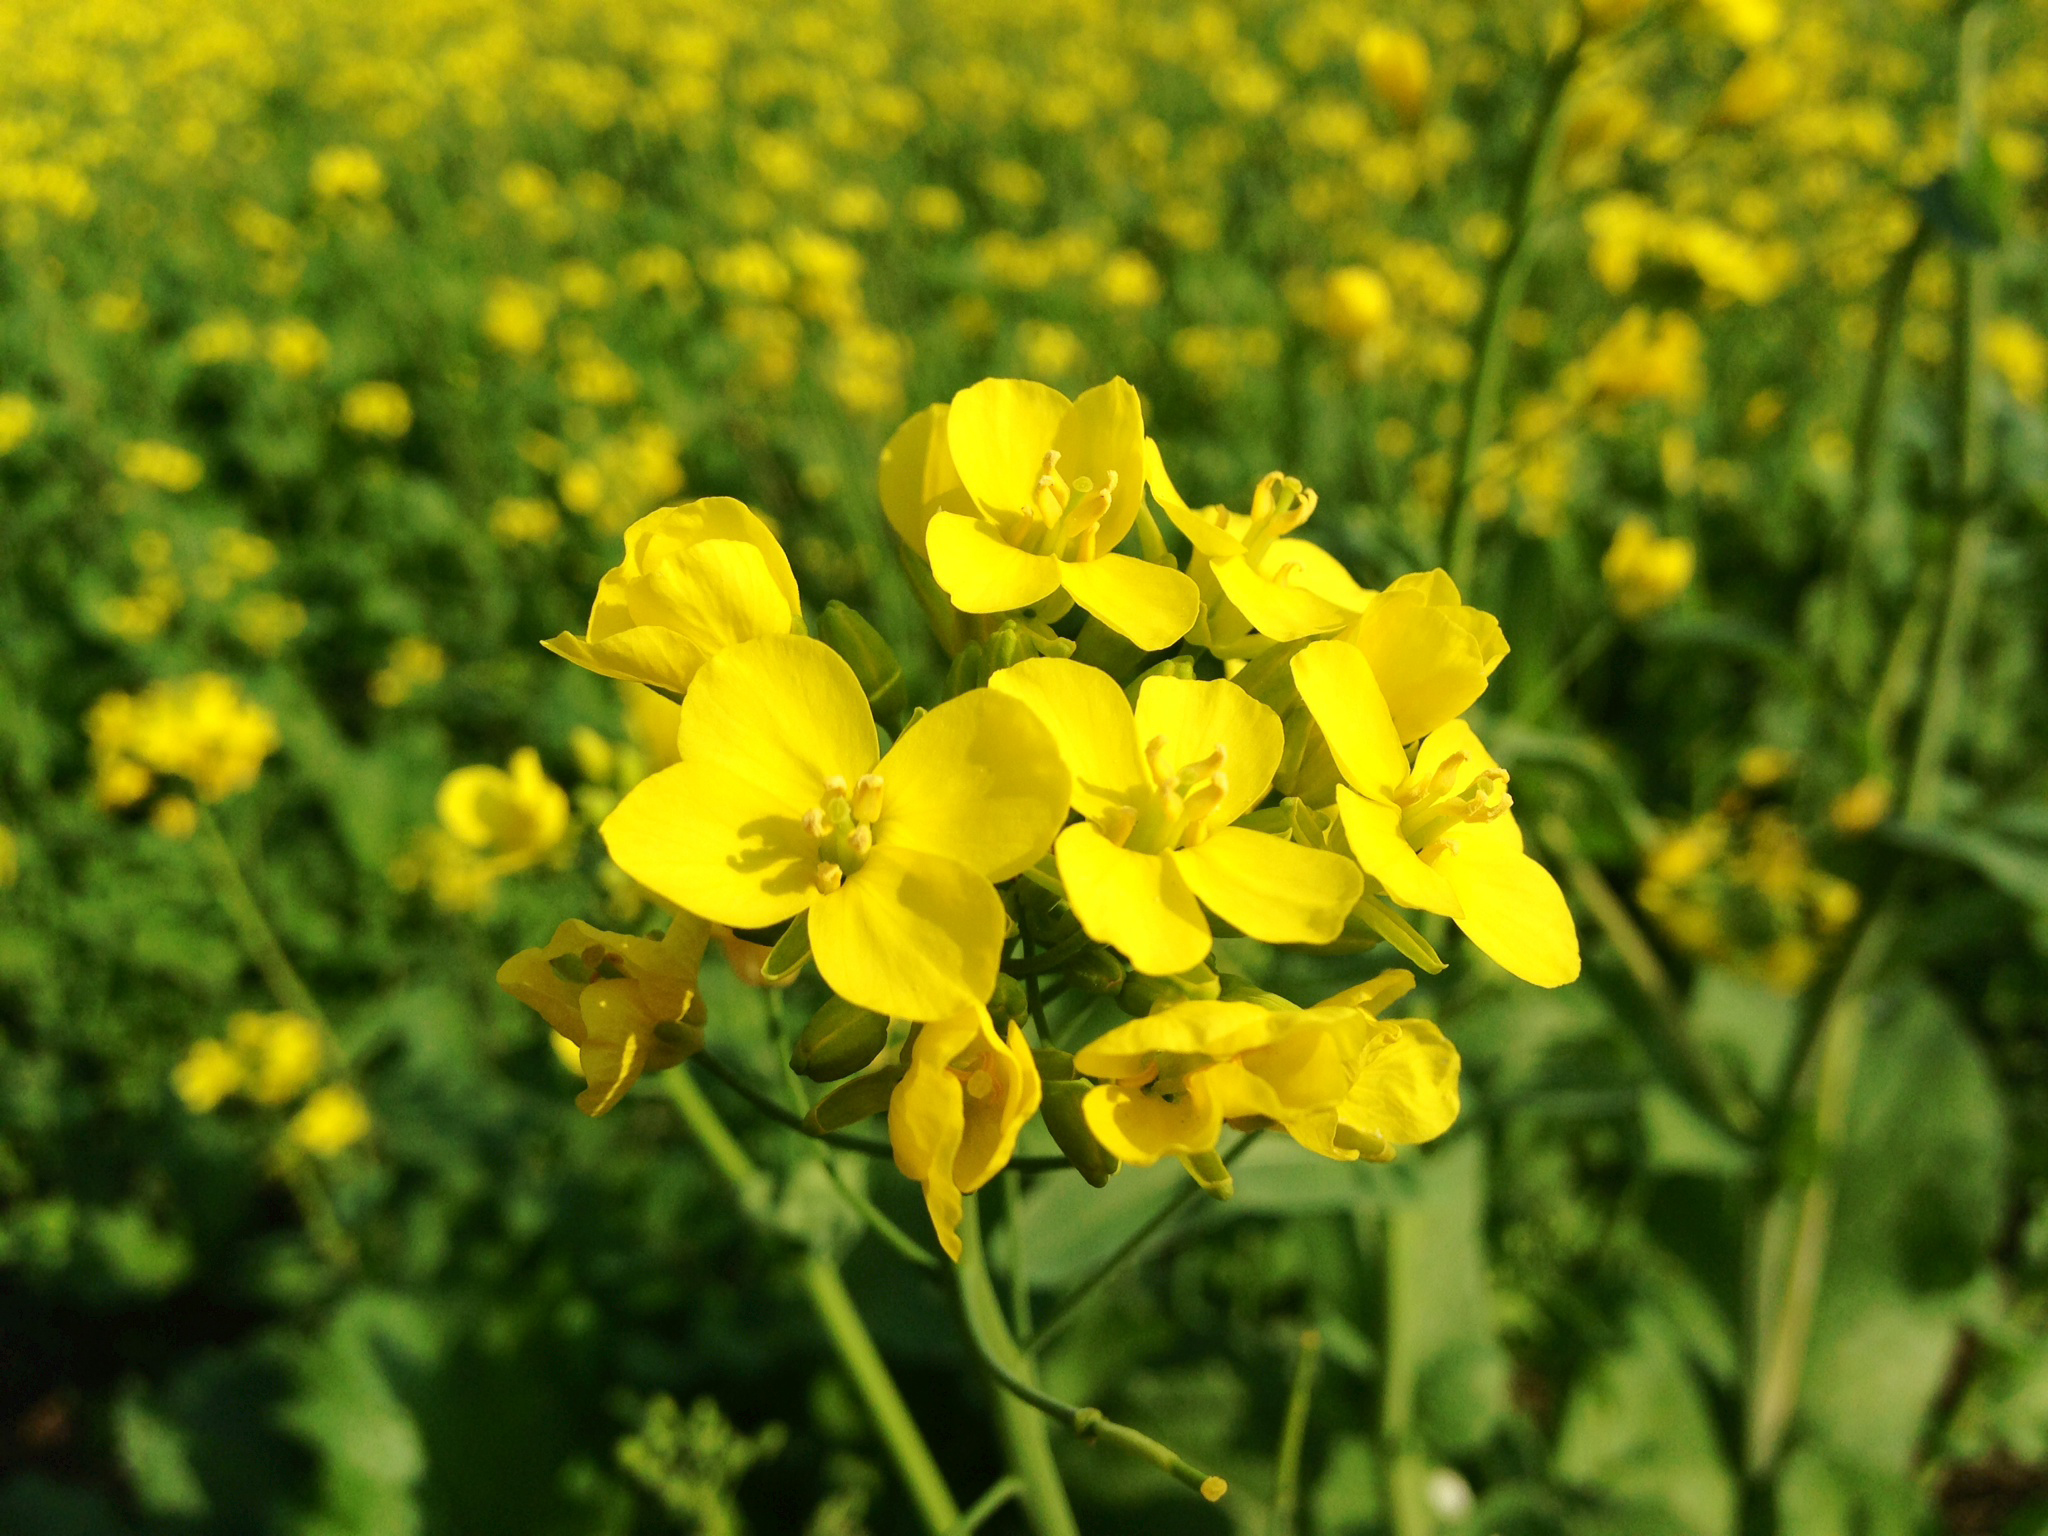 Close-up-flower-of-Mustard-greens